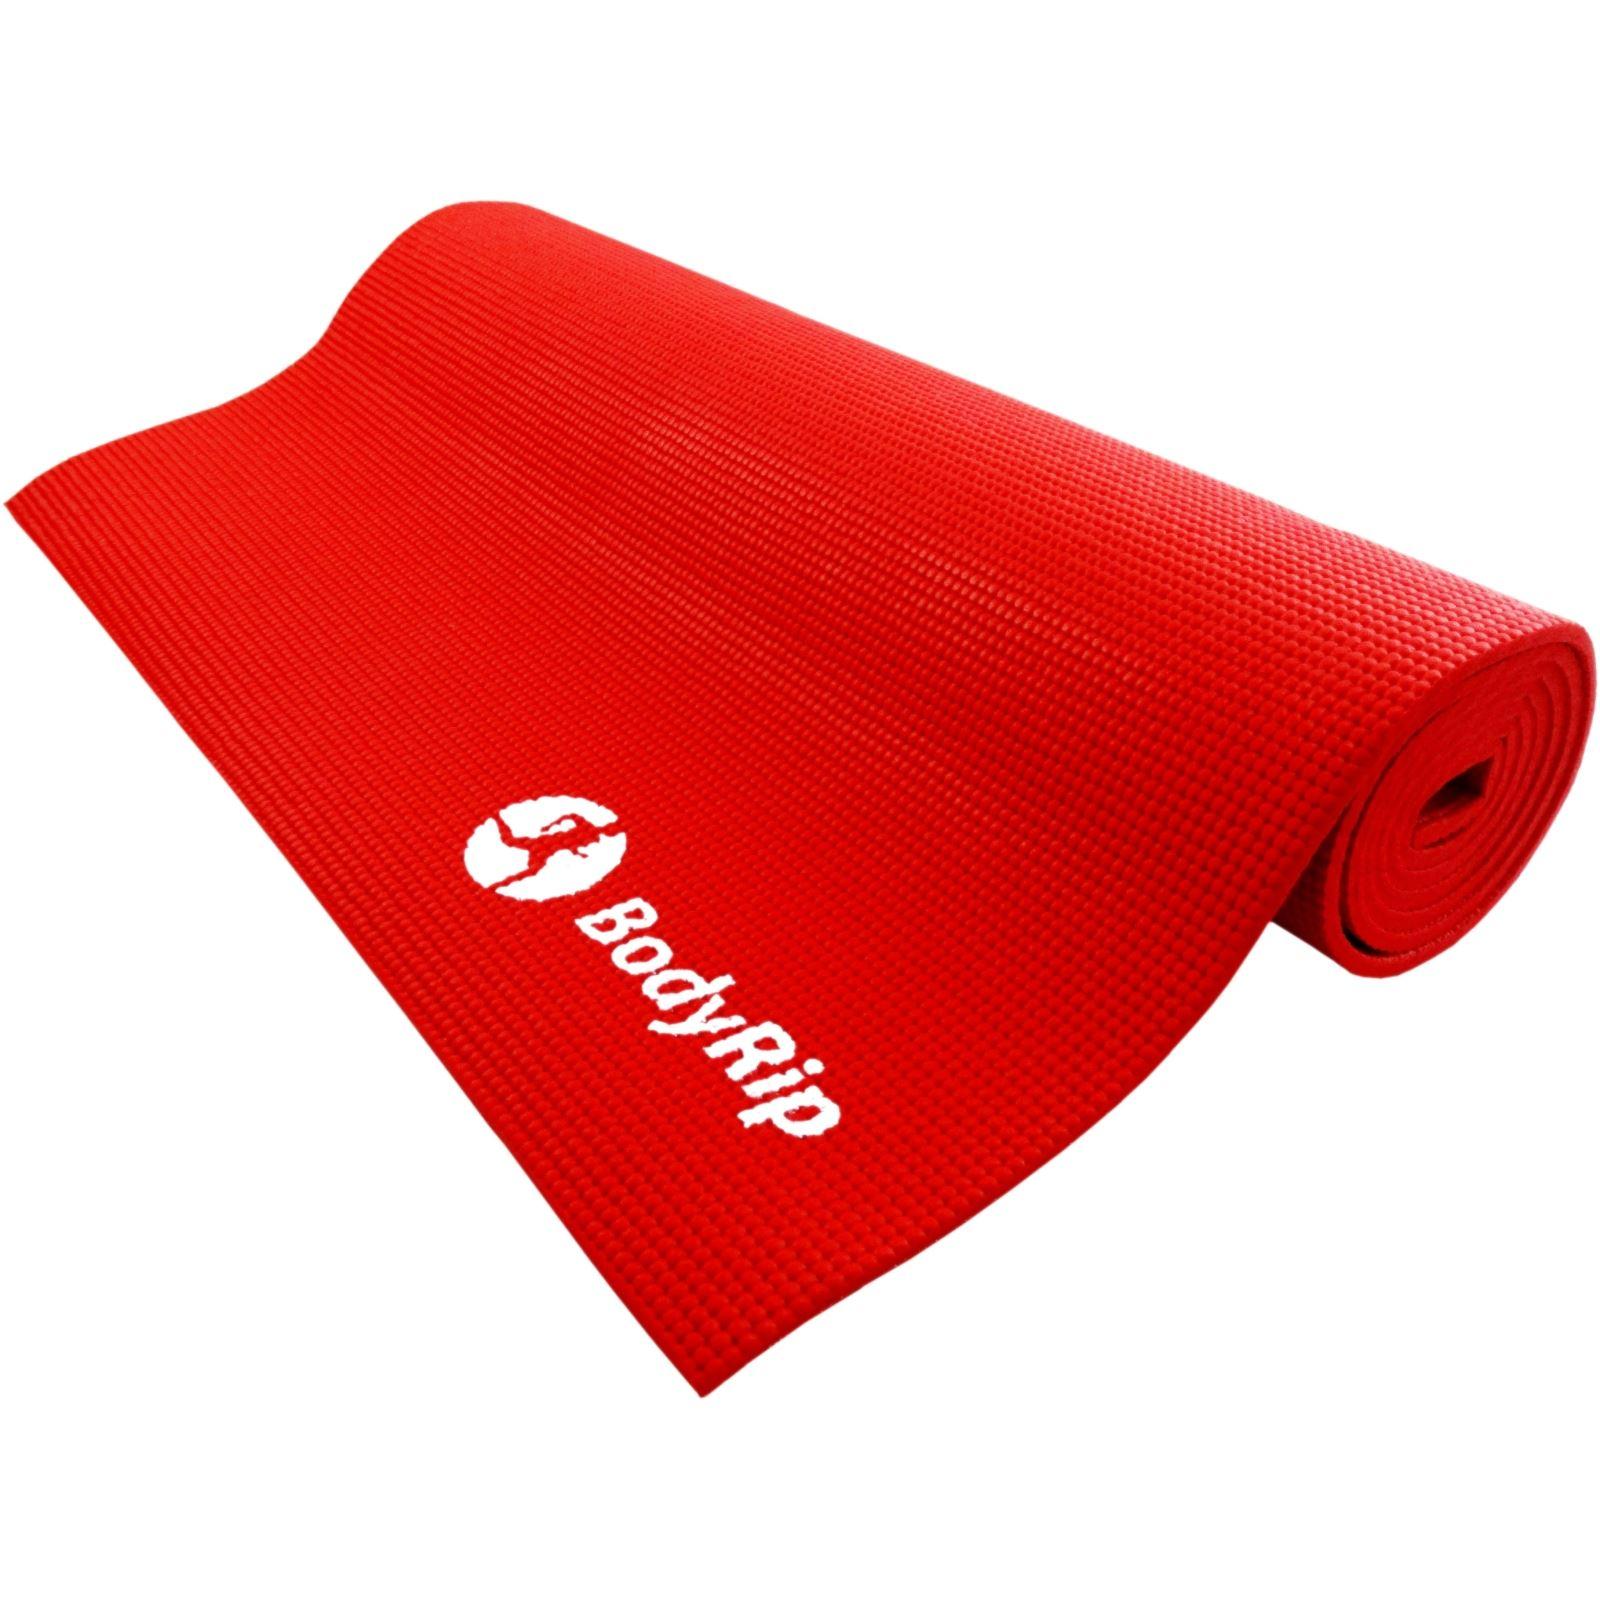 Bodyrip Red Thick Foam Yoga Pilates Gym Mat 6mm Exercise